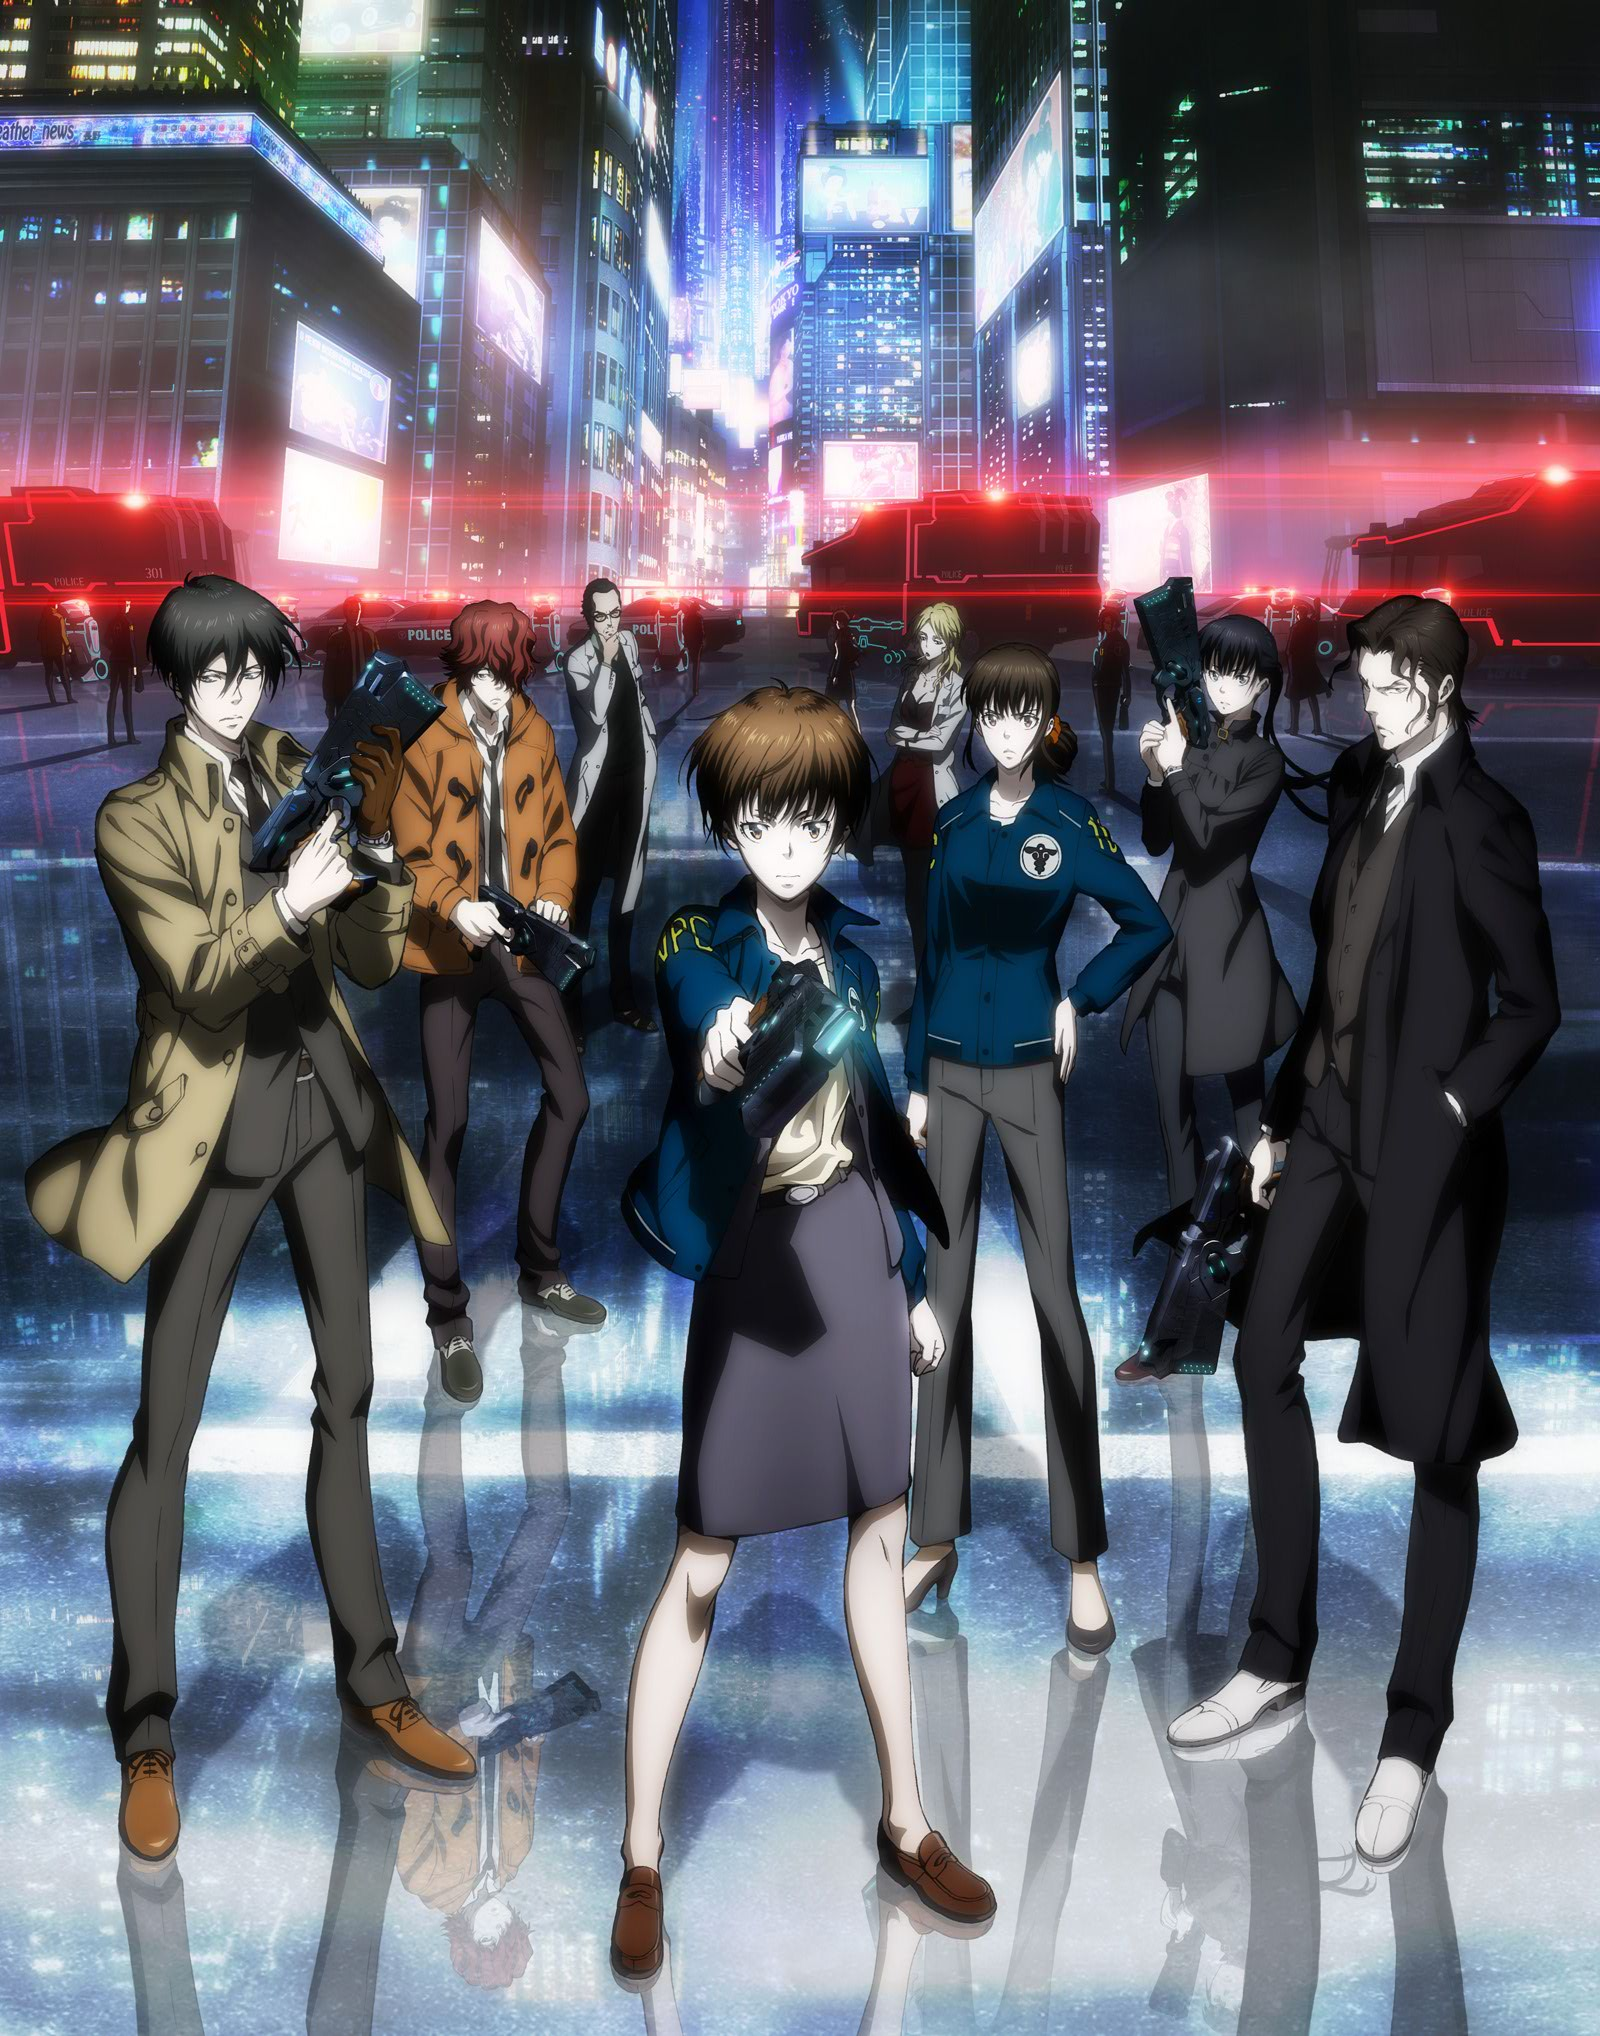 Psycho-Pass-2-anime-visual-haruhichan.com-Gen-Urobuchi-psycho-pass-season-2